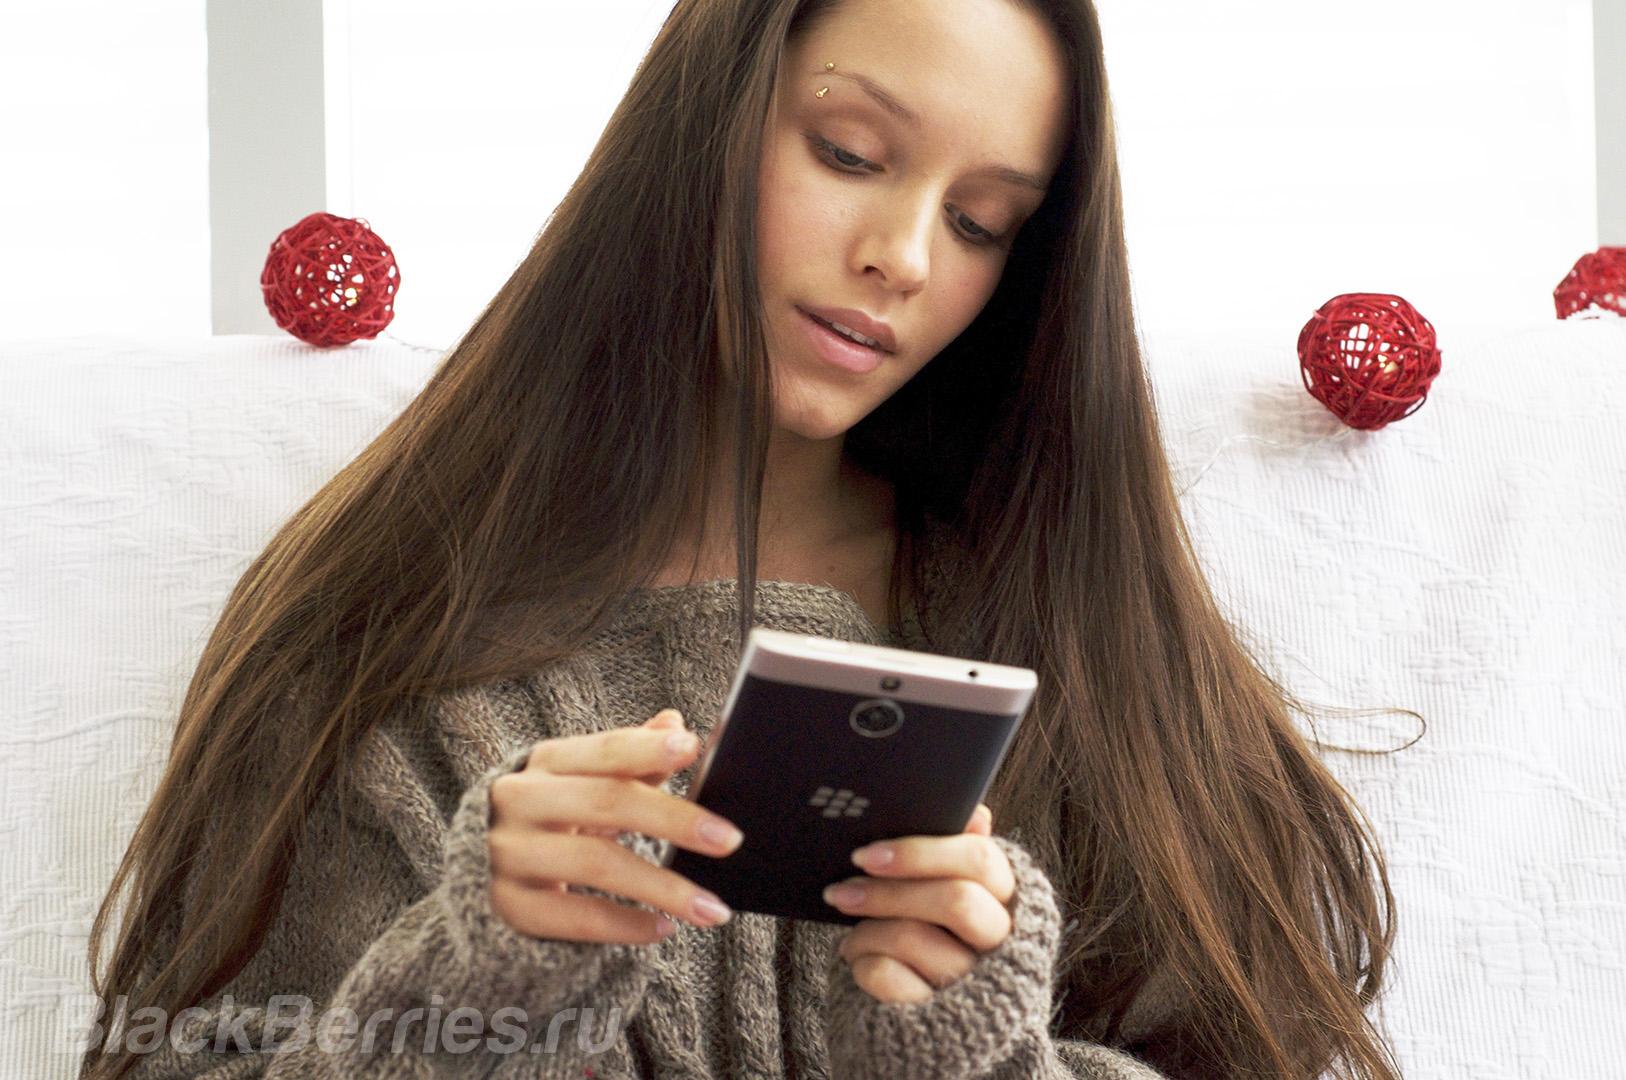 blackberry-passport-se-new-year-08